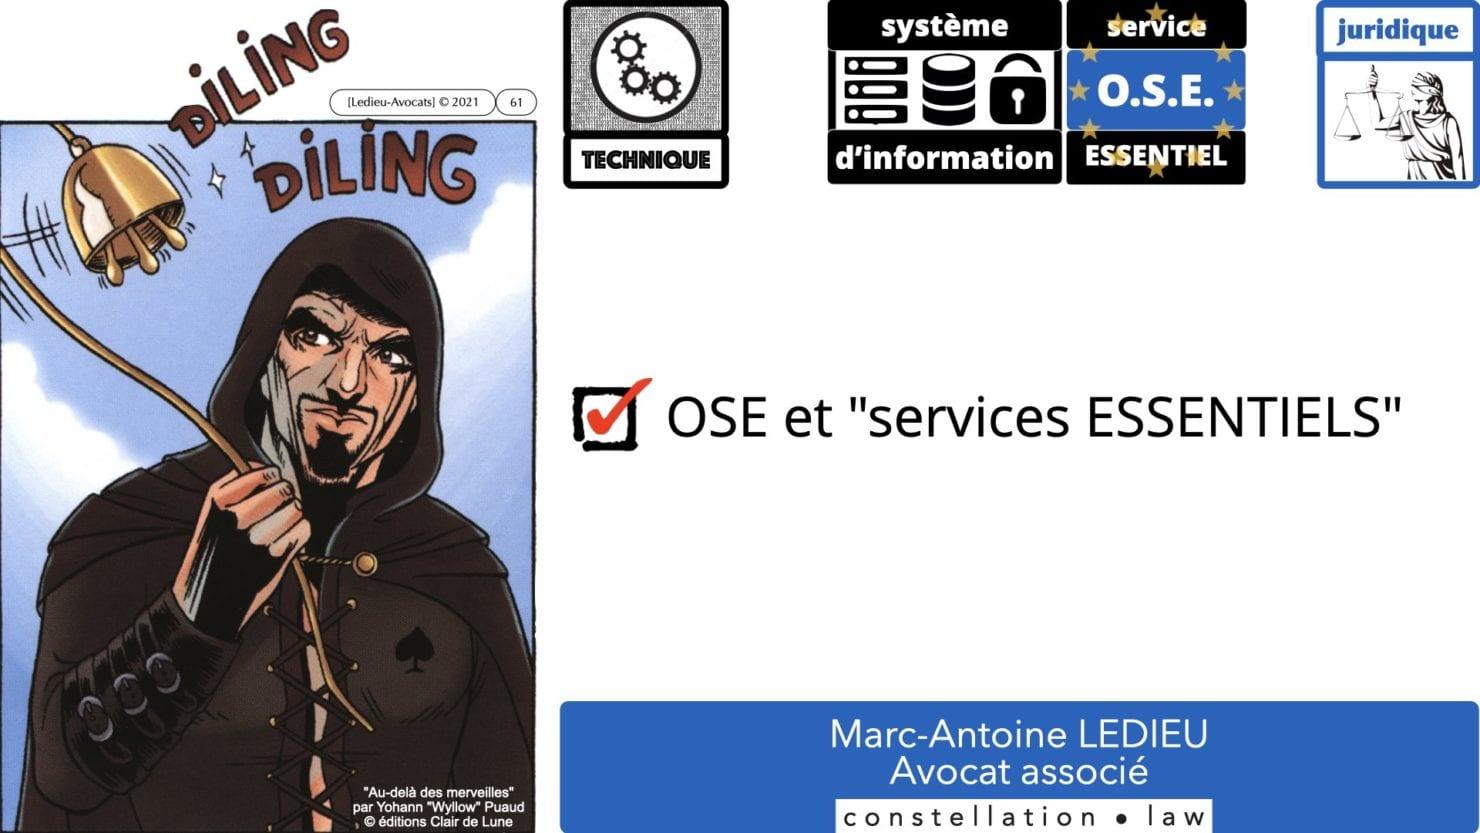 337 cyber sécurité #1 OIV OSE Critical Entities © Ledieu-avocat 15-06-2021.061